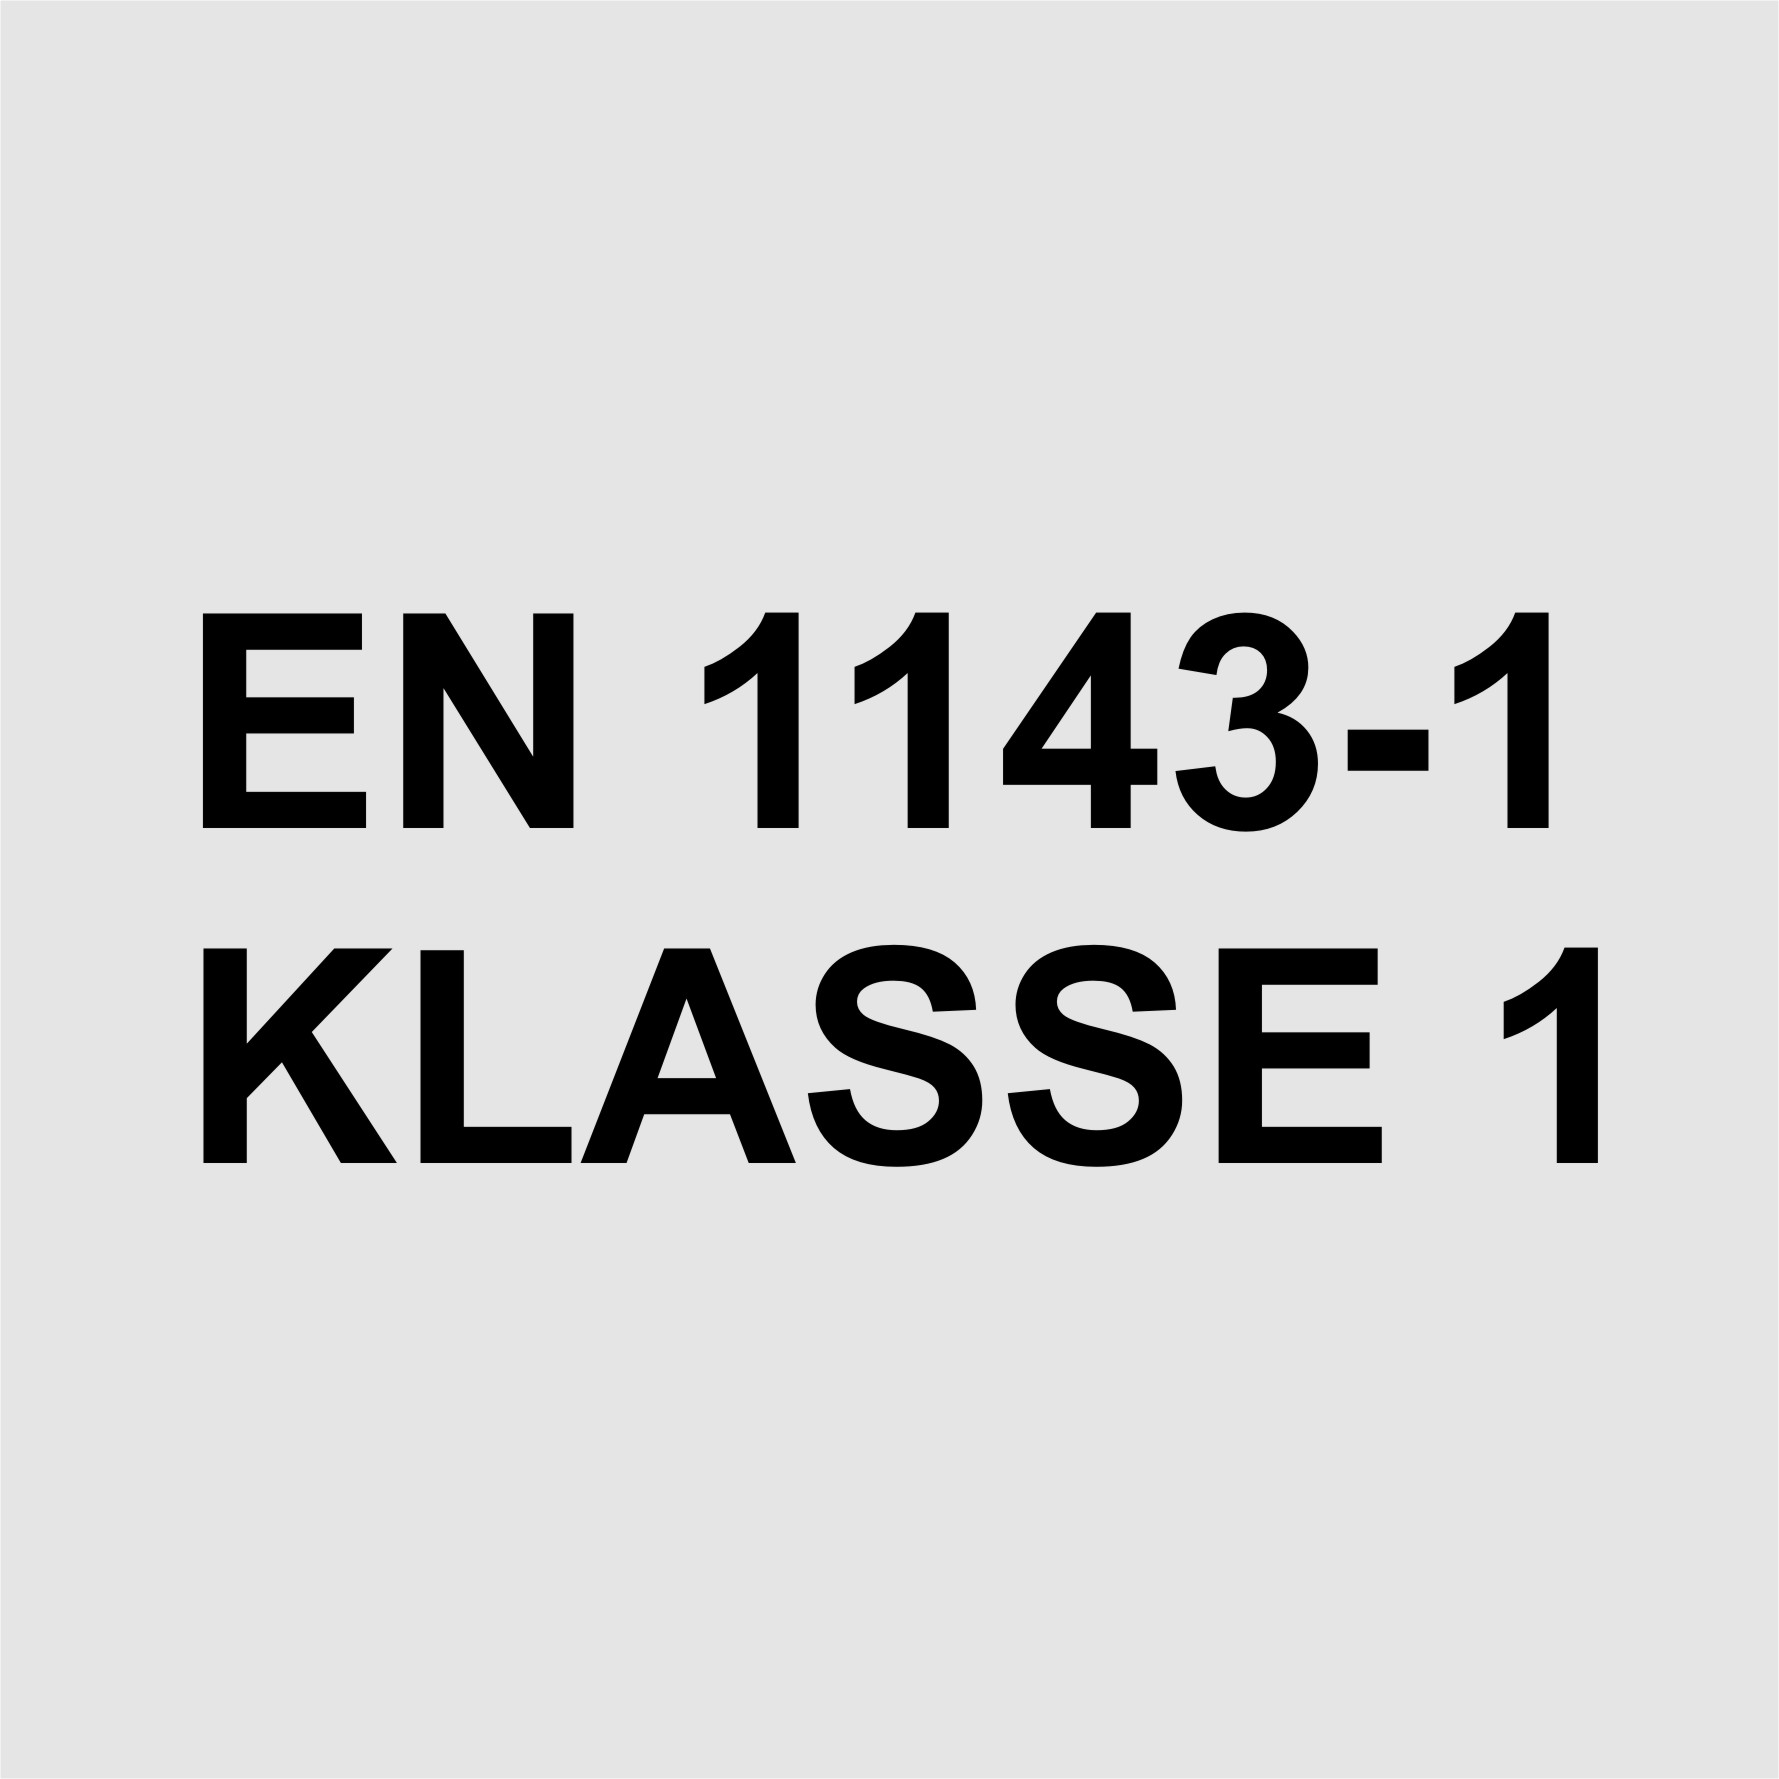 Klasse 1 nach EN 1143-1 + 39,00 Euro 1.383,00 €